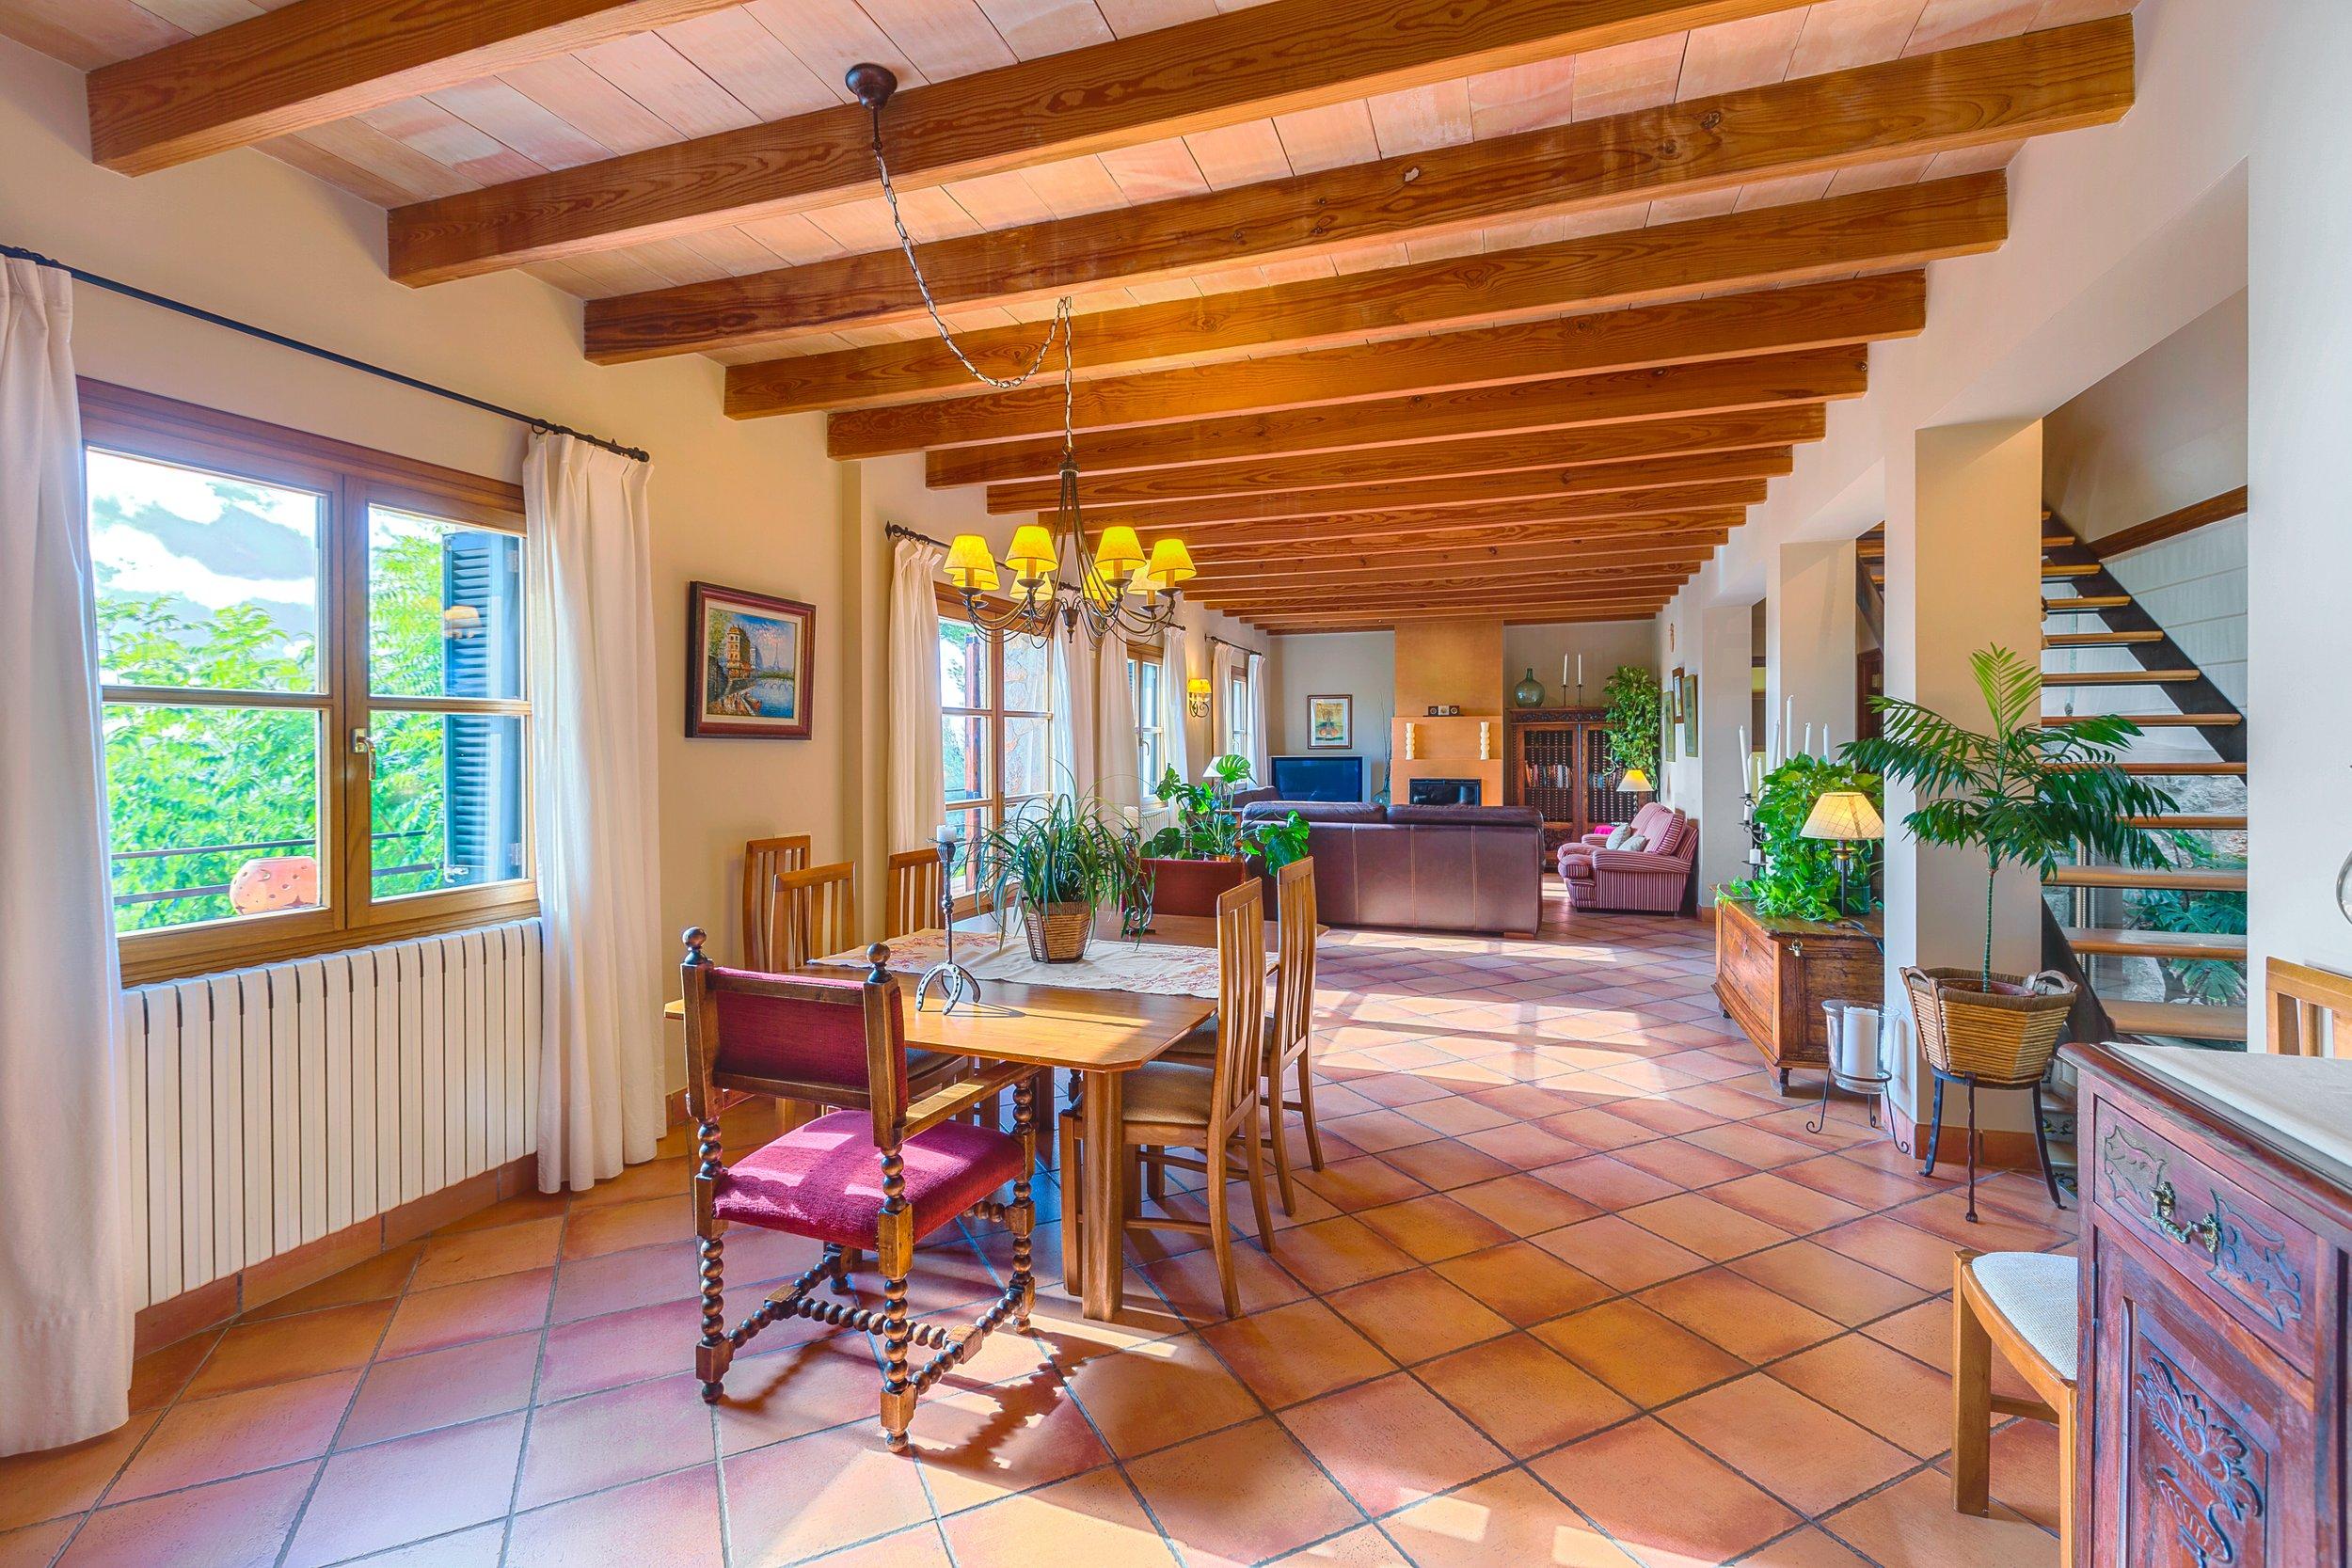 Maison de vacances Villa Cirera in Alaro (2611793), Alaro, Majorque, Iles Baléares, Espagne, image 12